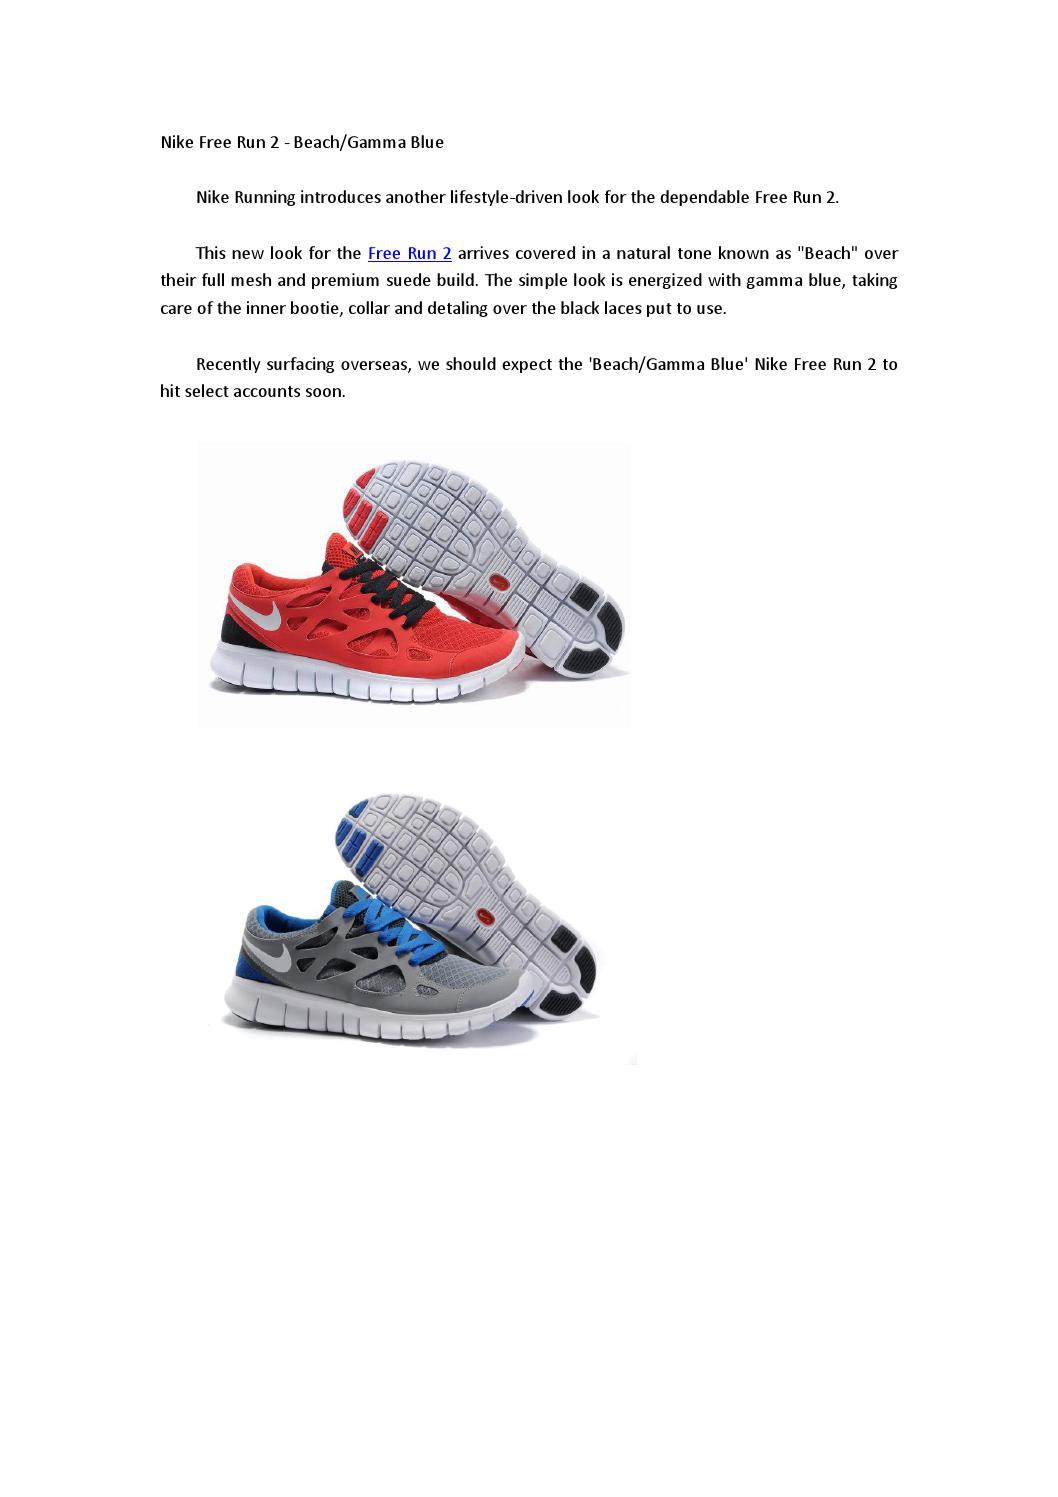 Nike free run 2 by RobbieBatto - issuu 048124cac9ab